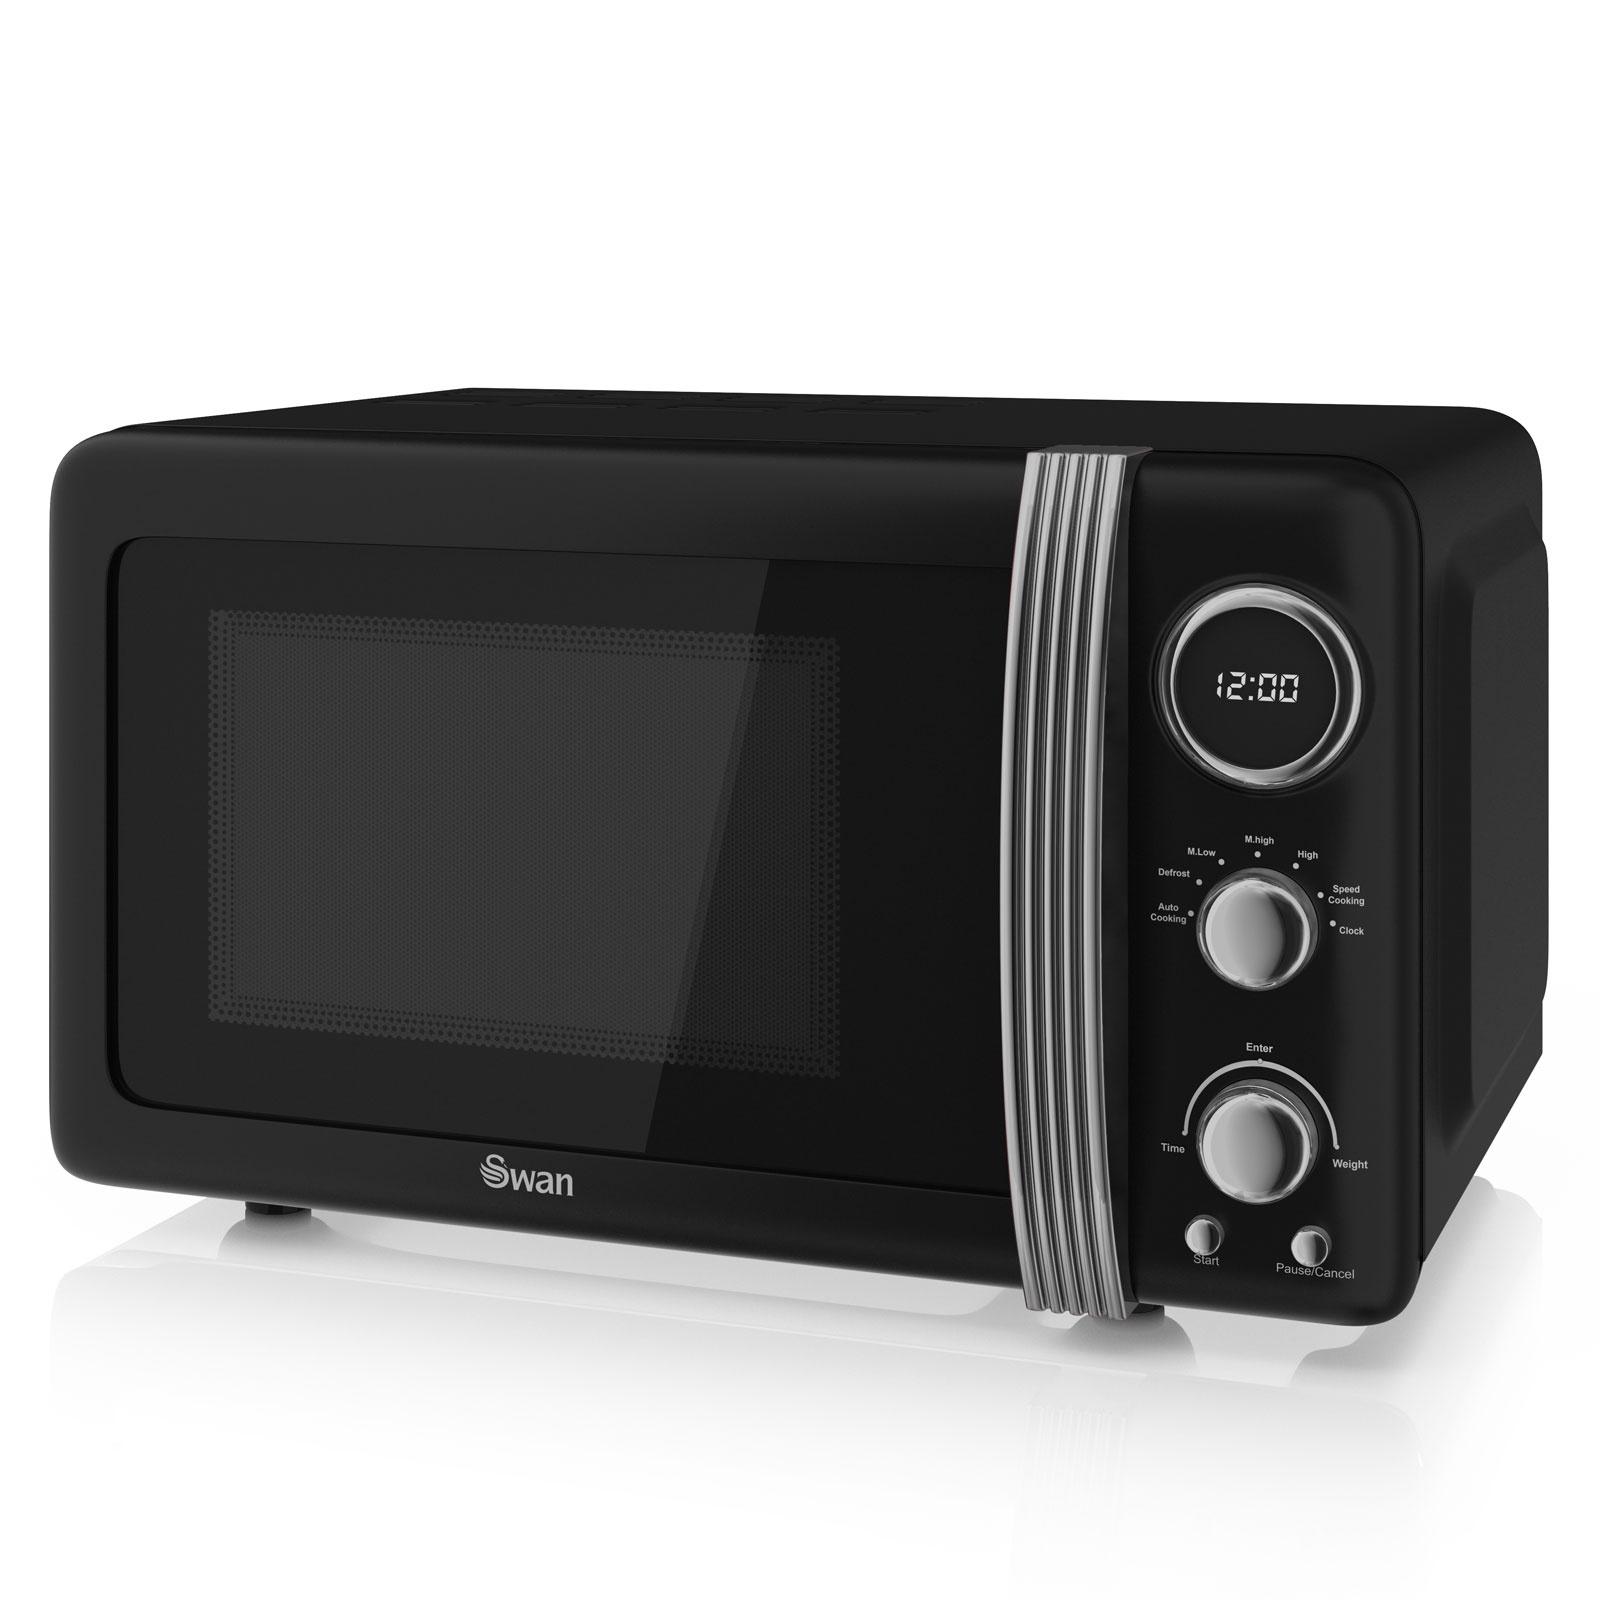 Swan Black Retro Set Digital Microwave